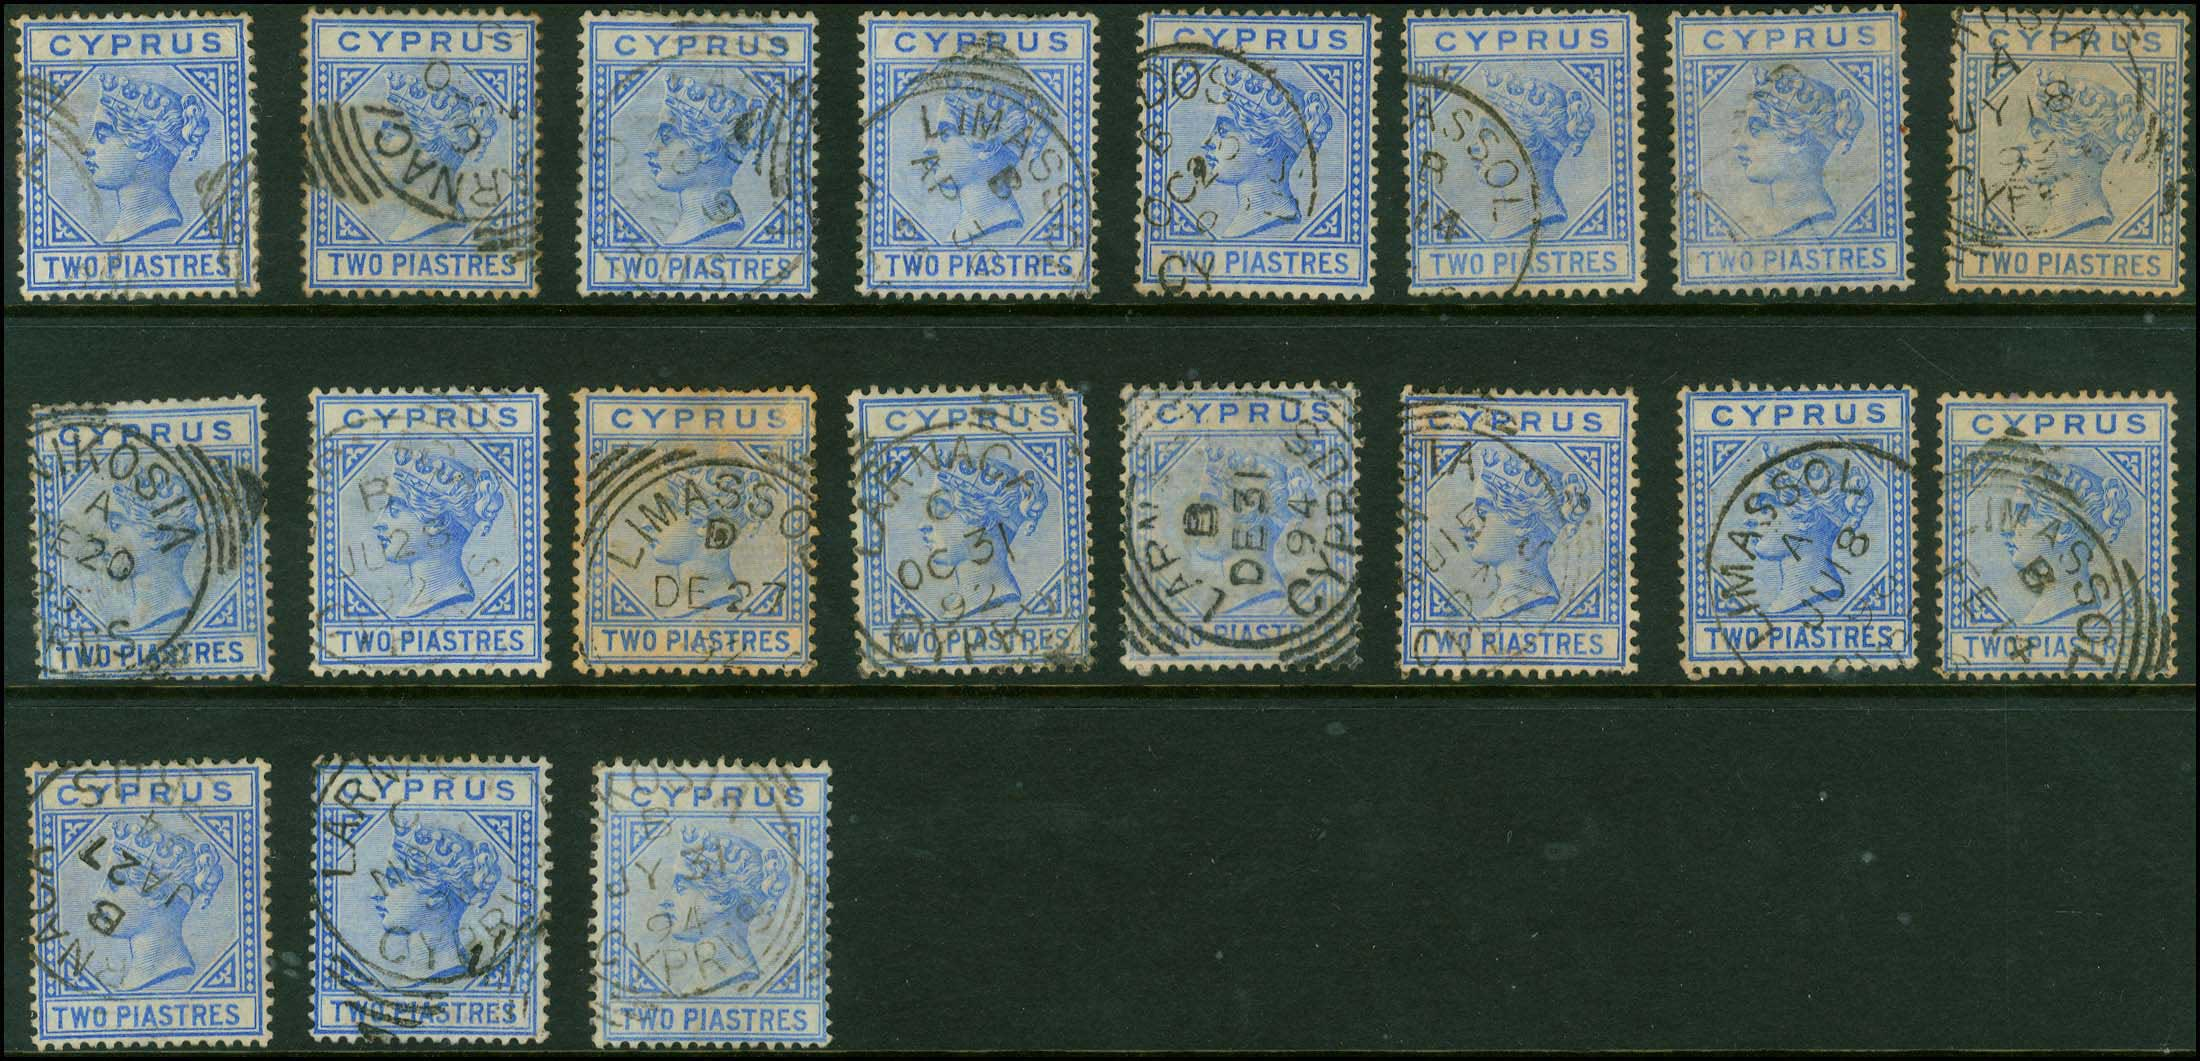 Lot 1358 - -  CYPRUS Cyprus -  A. Karamitsos Public Auction 637 General Stamp Sale